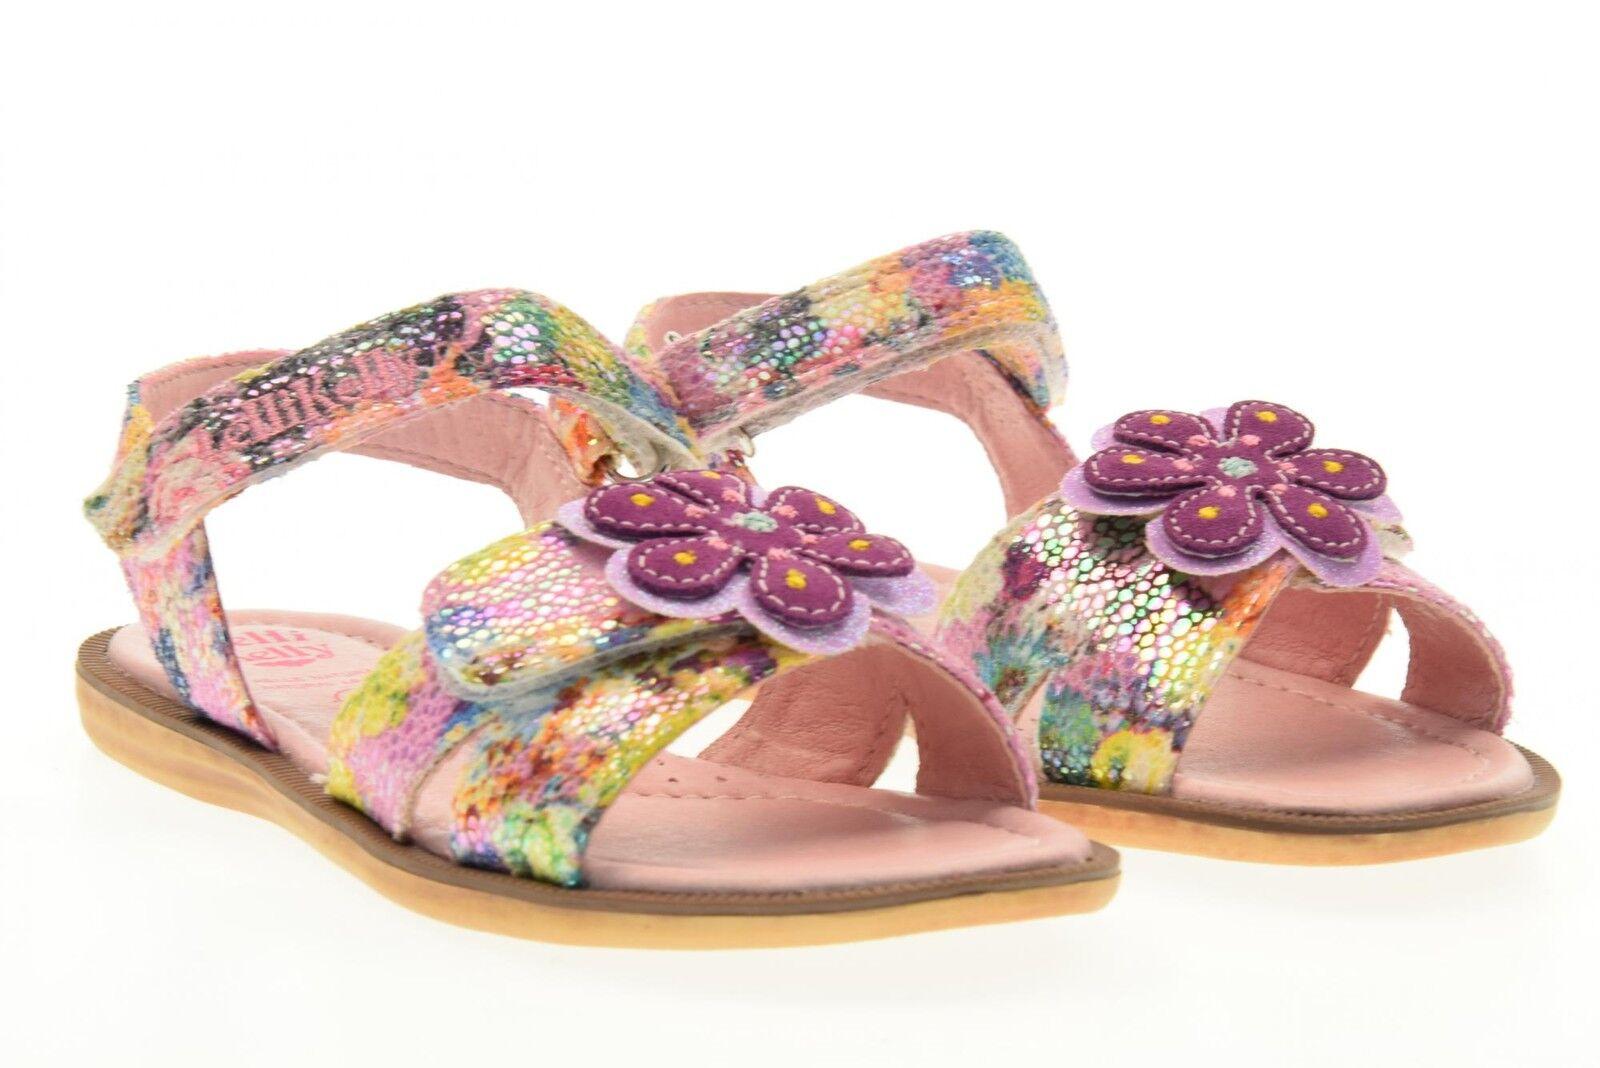 Lelli Kelly scarpe bambina sandali P17 LK4500 FIORE FANTASIA LILLA P17 sandali 584070